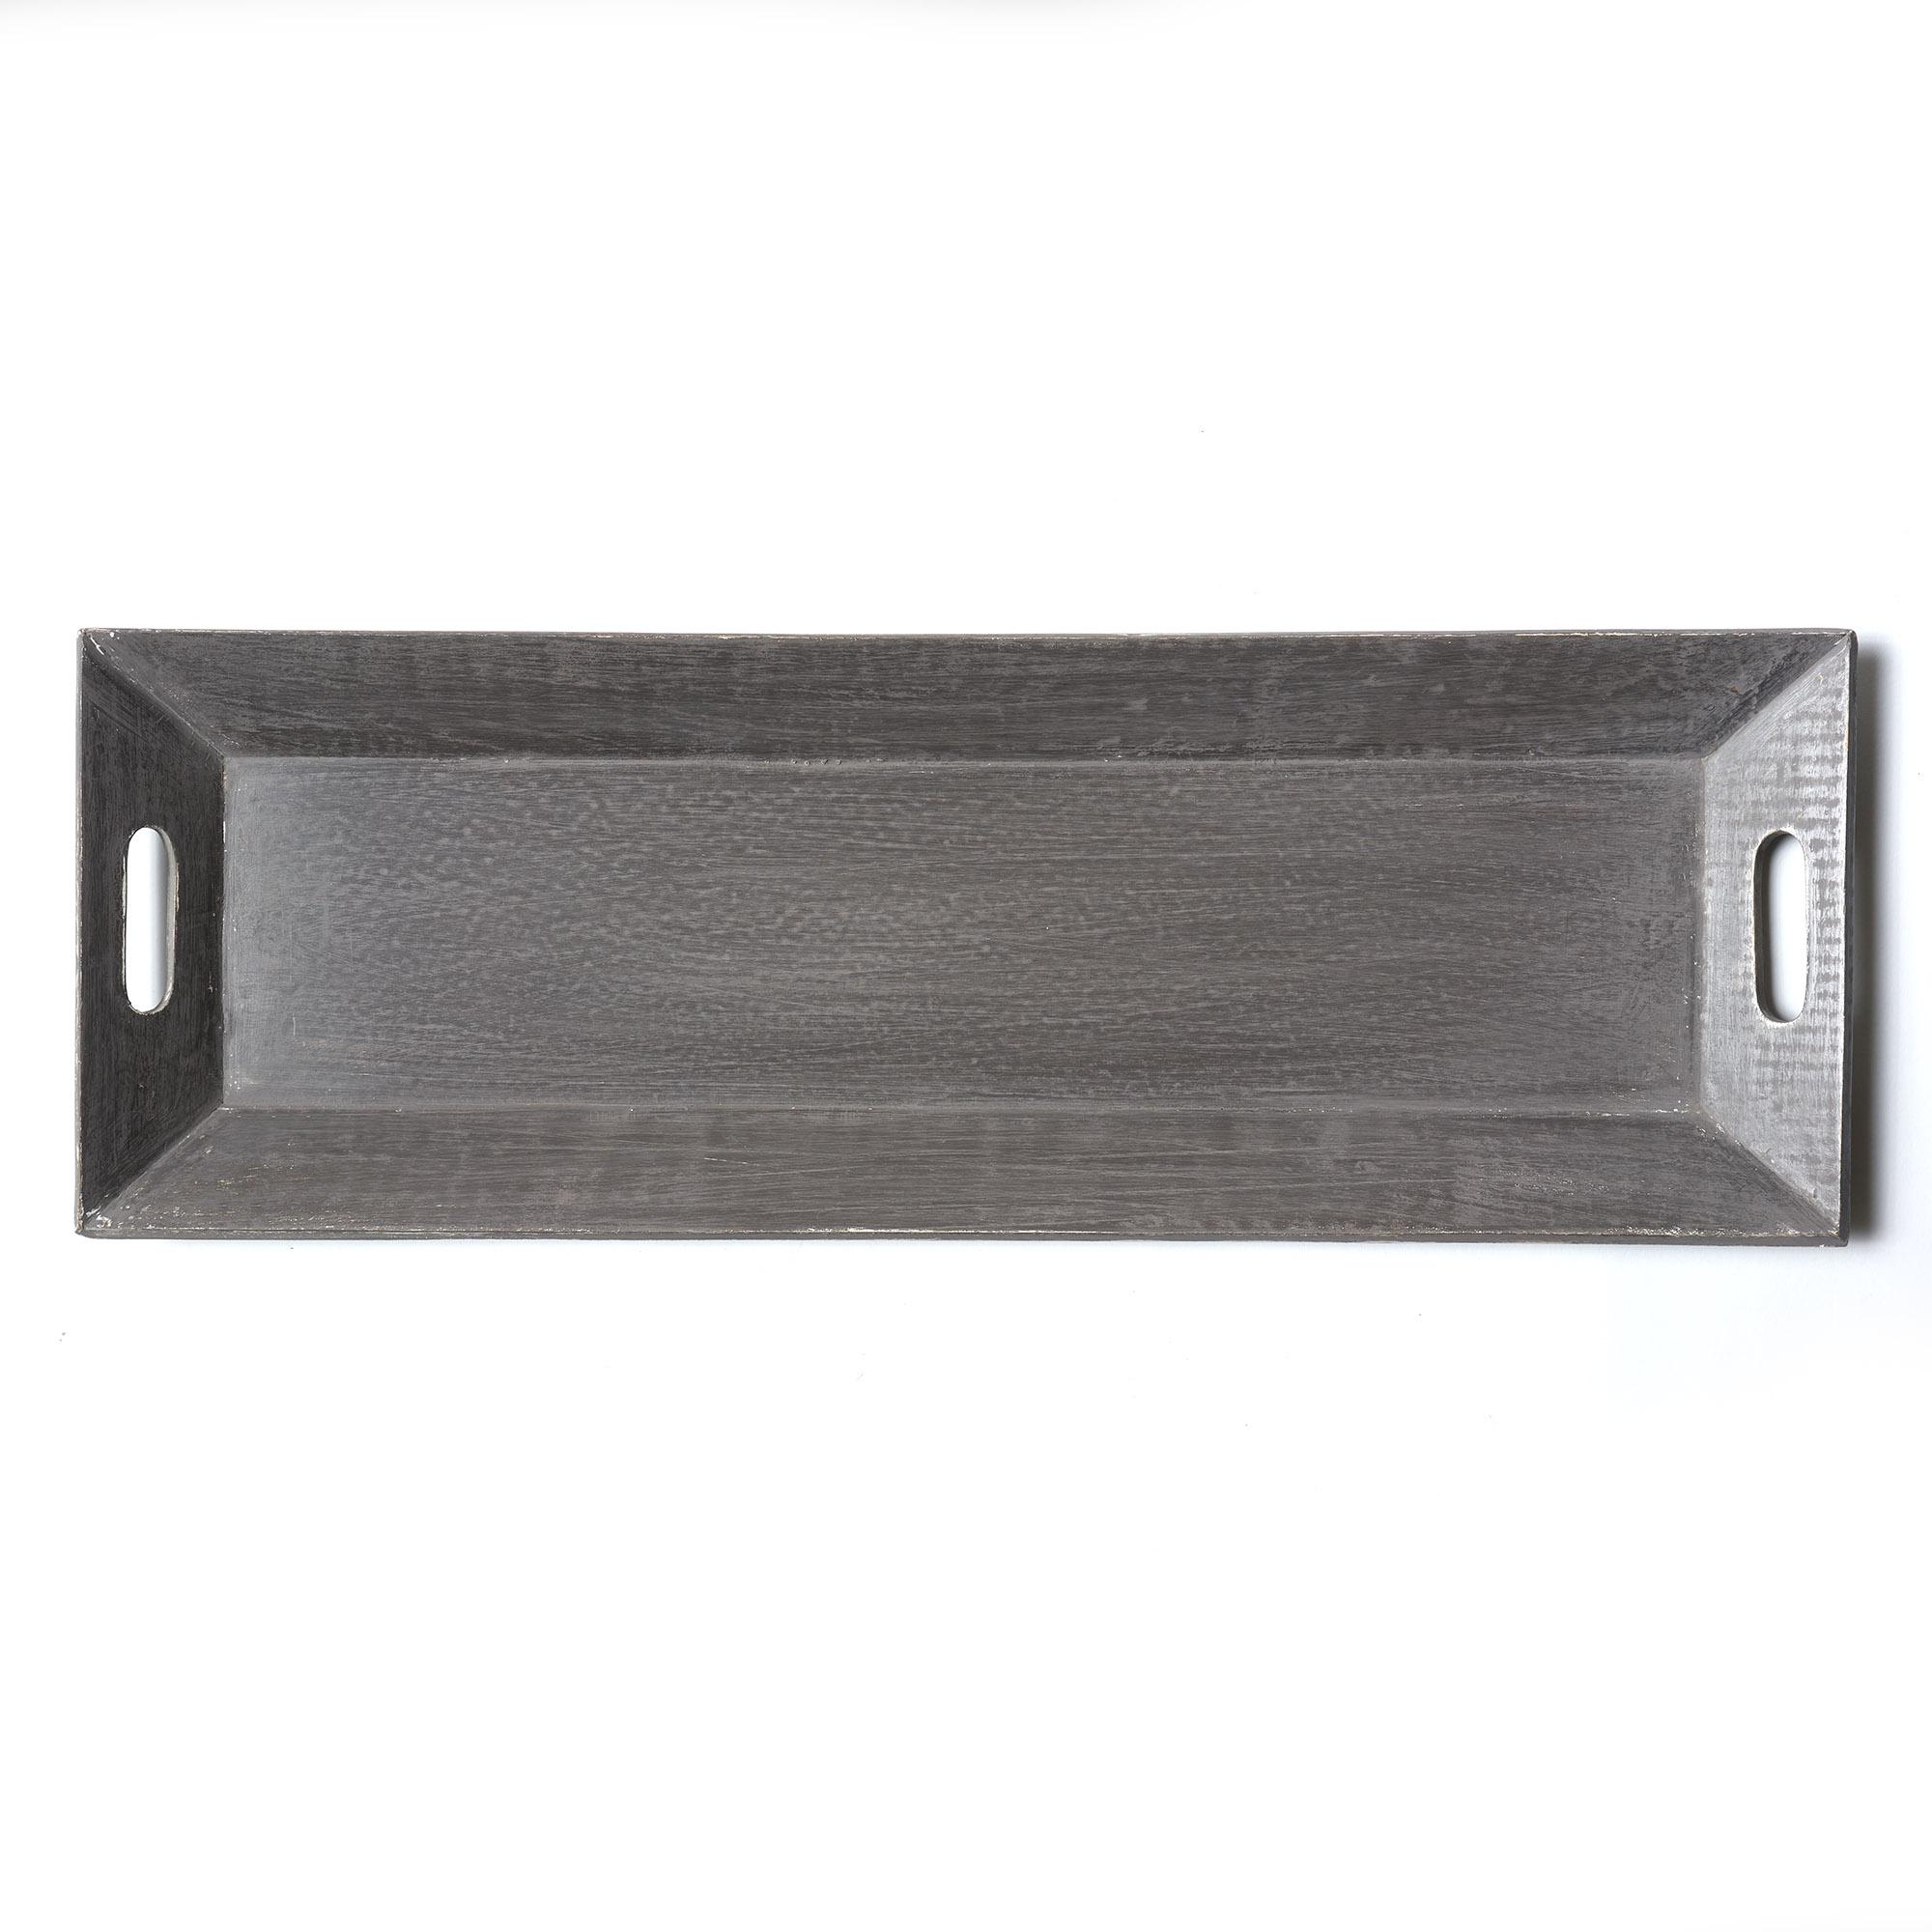 Bandeja de madera patinada gris 29 x 72 cm